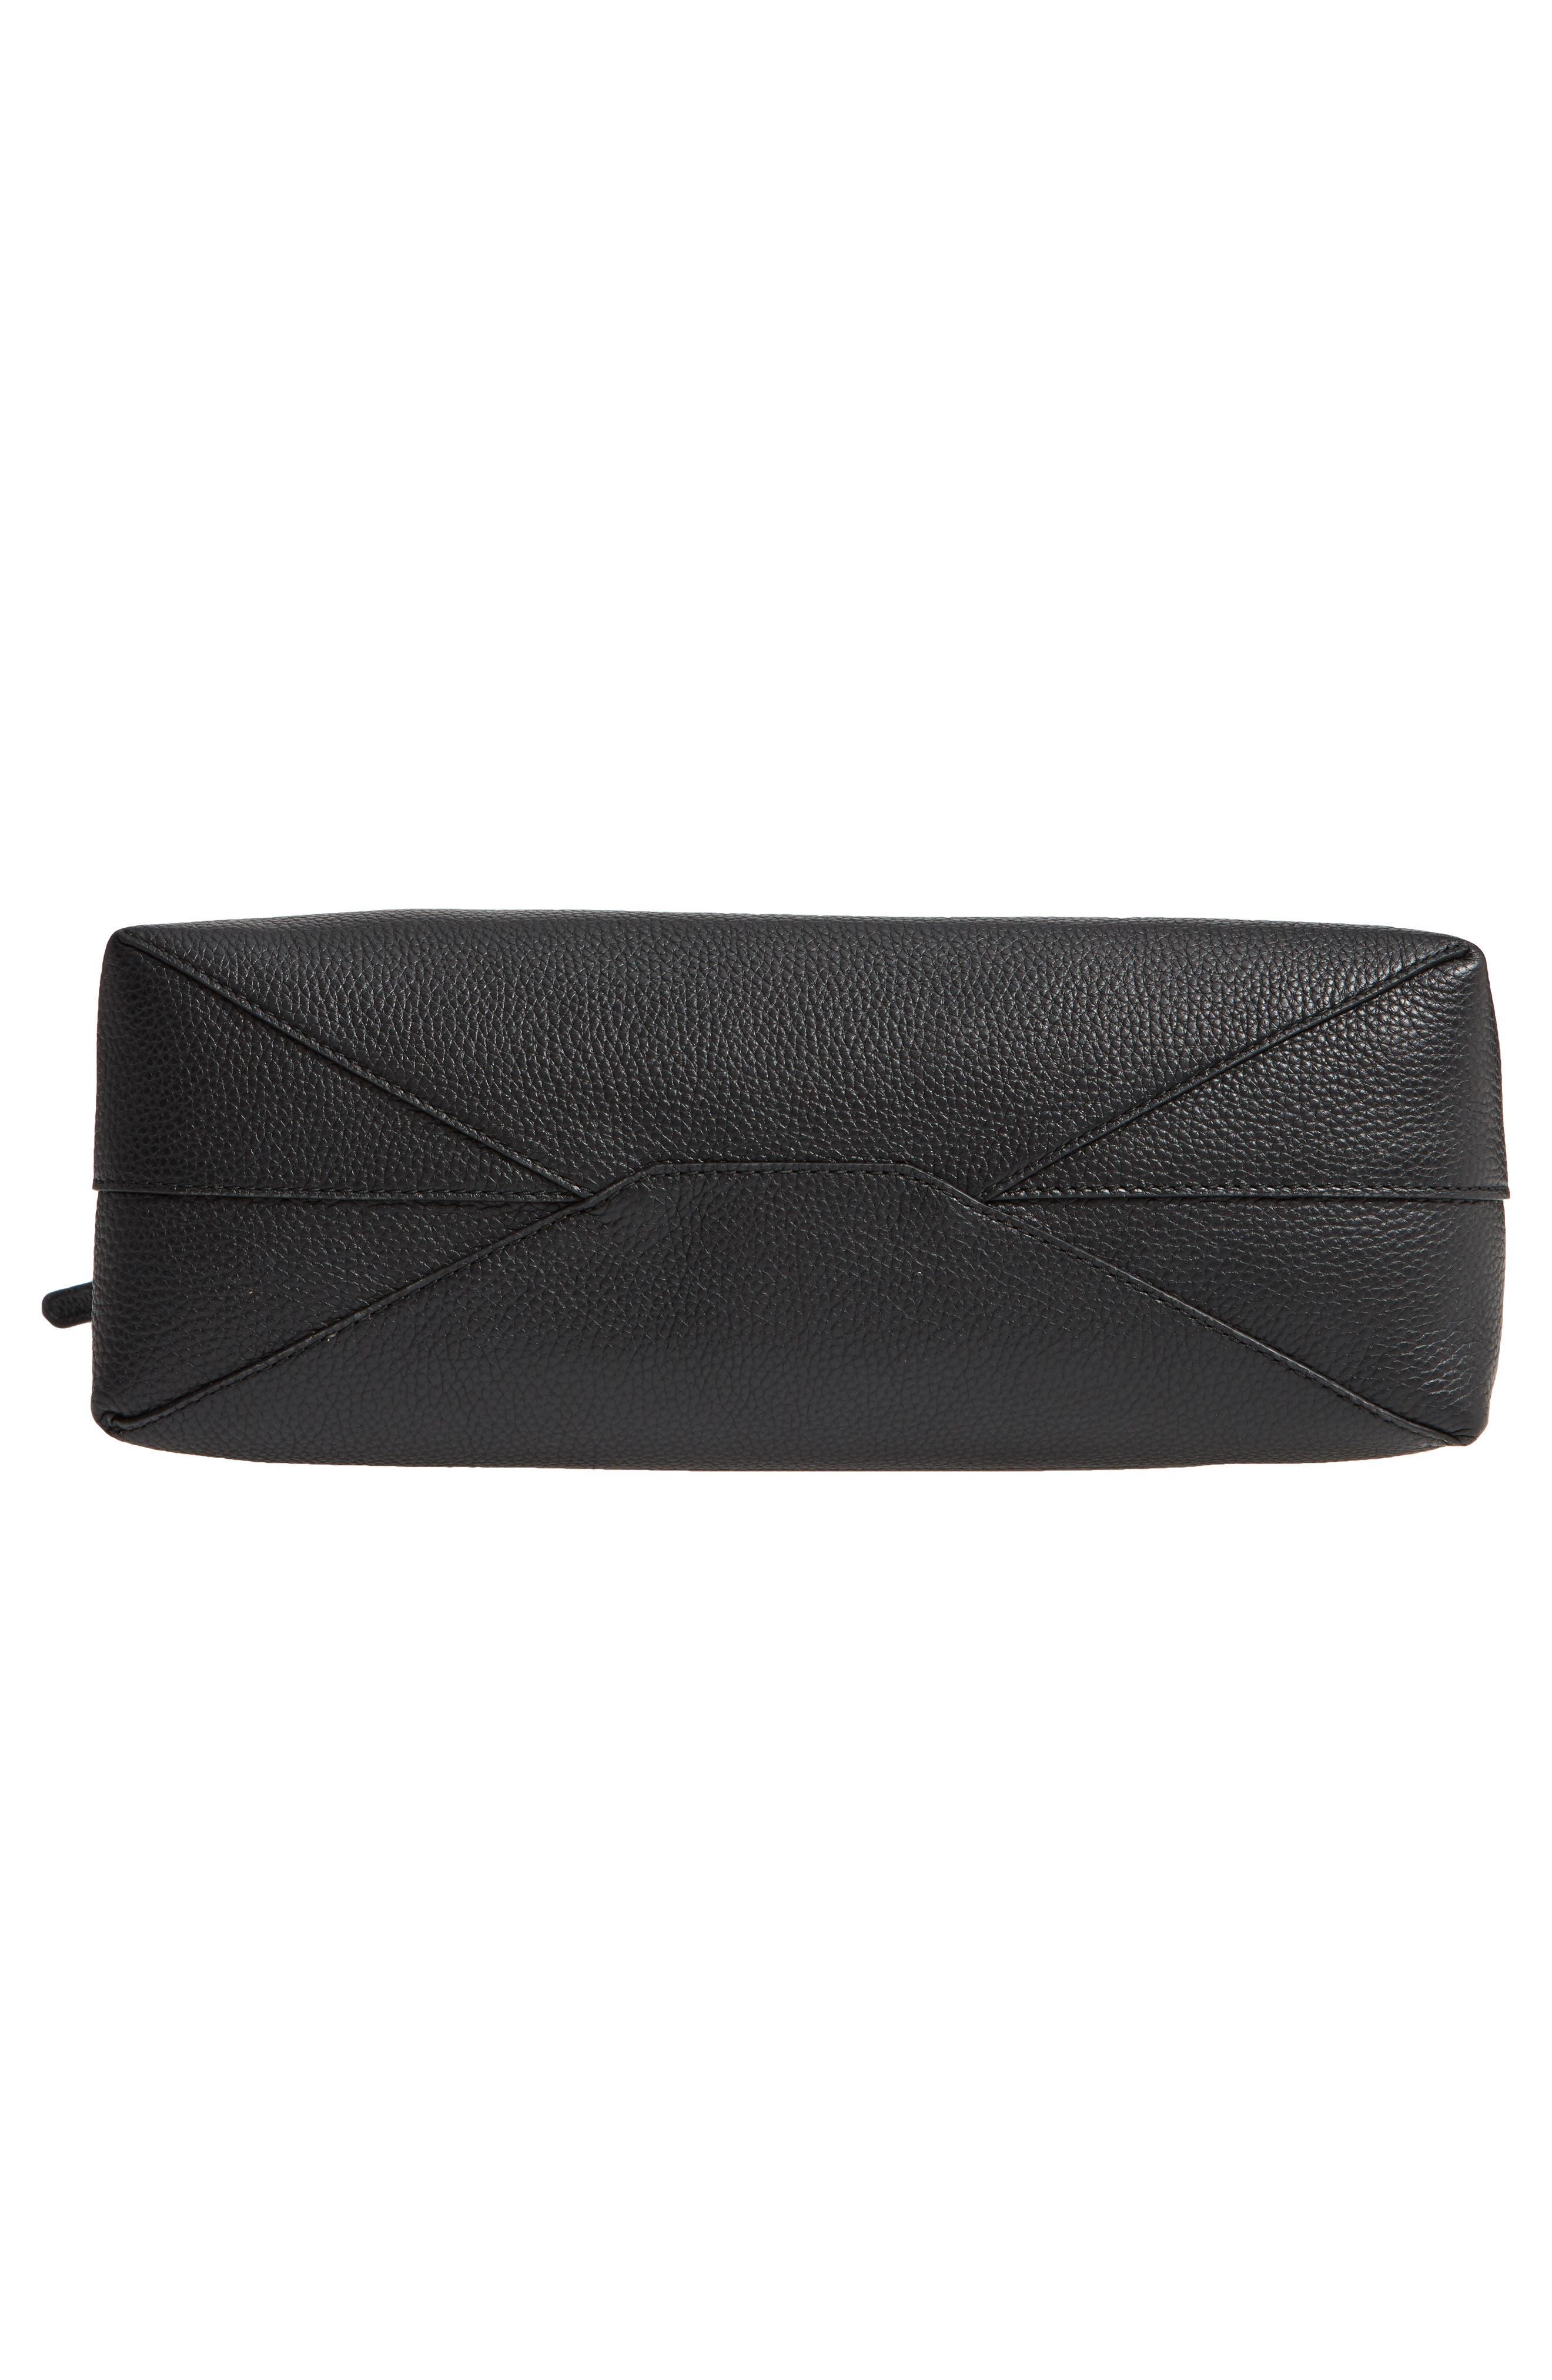 Medium Leather Hobo,                             Alternate thumbnail 6, color,                             BLACK